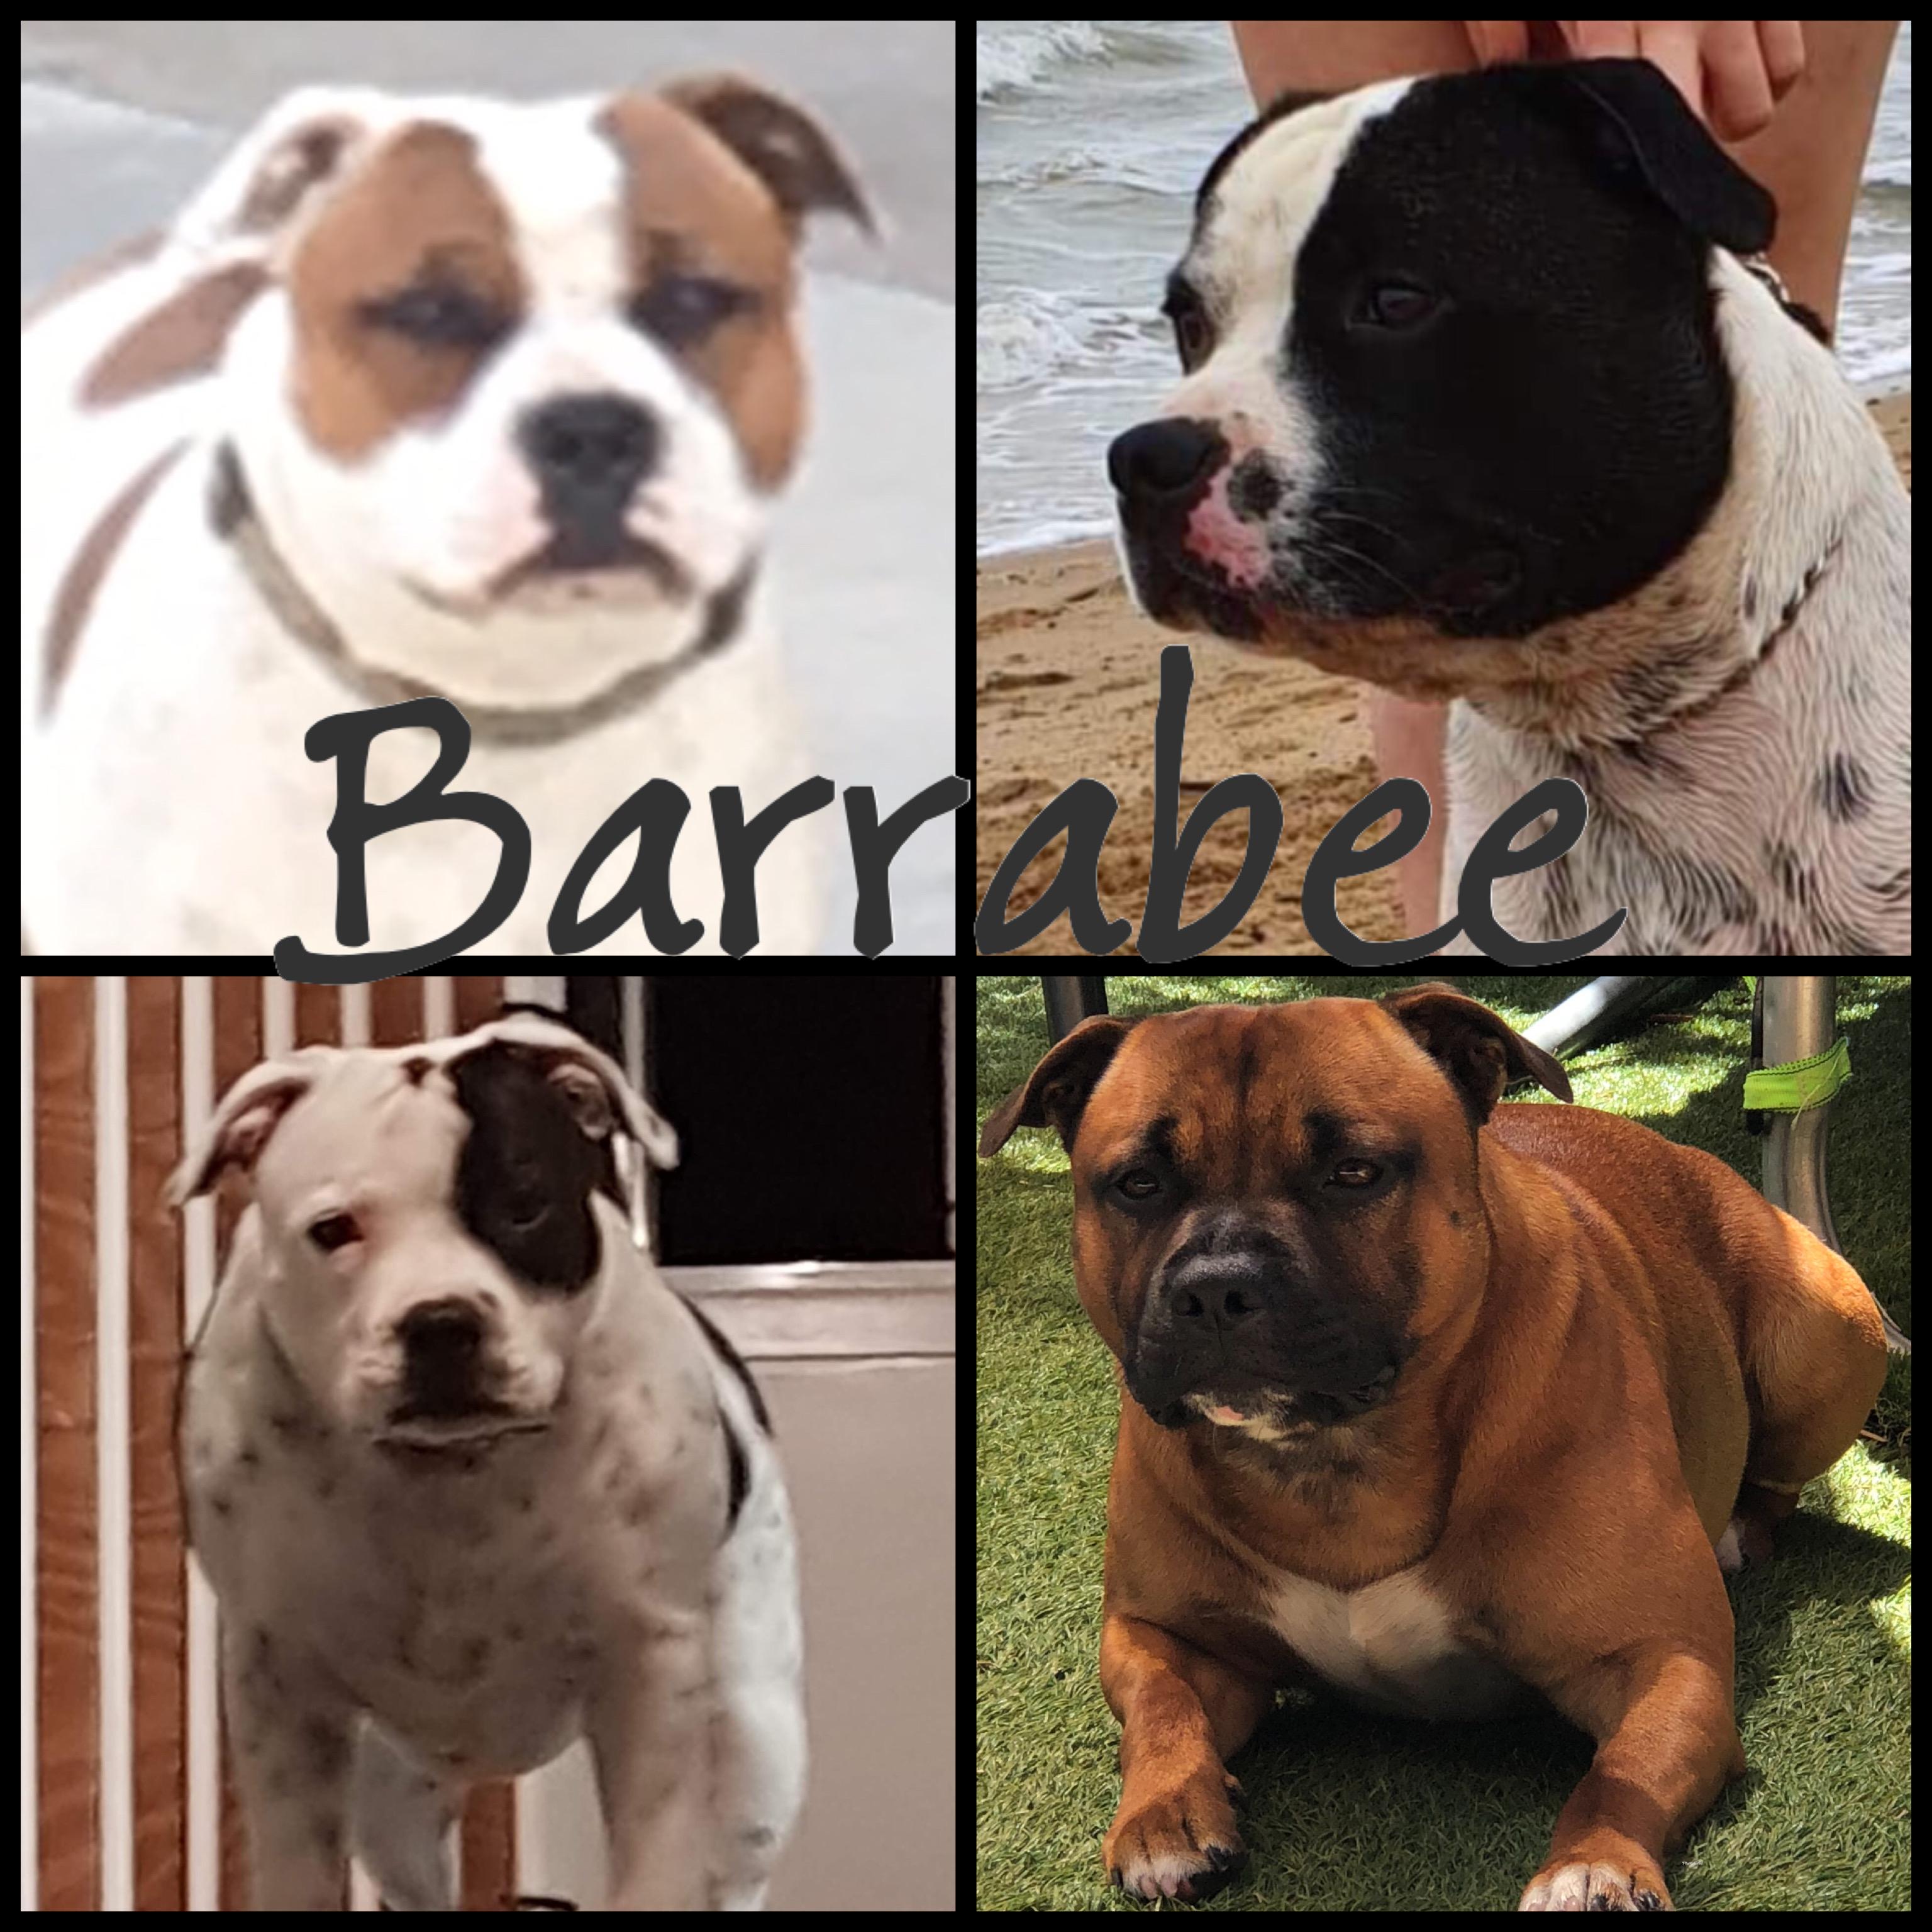 Barrabee bred